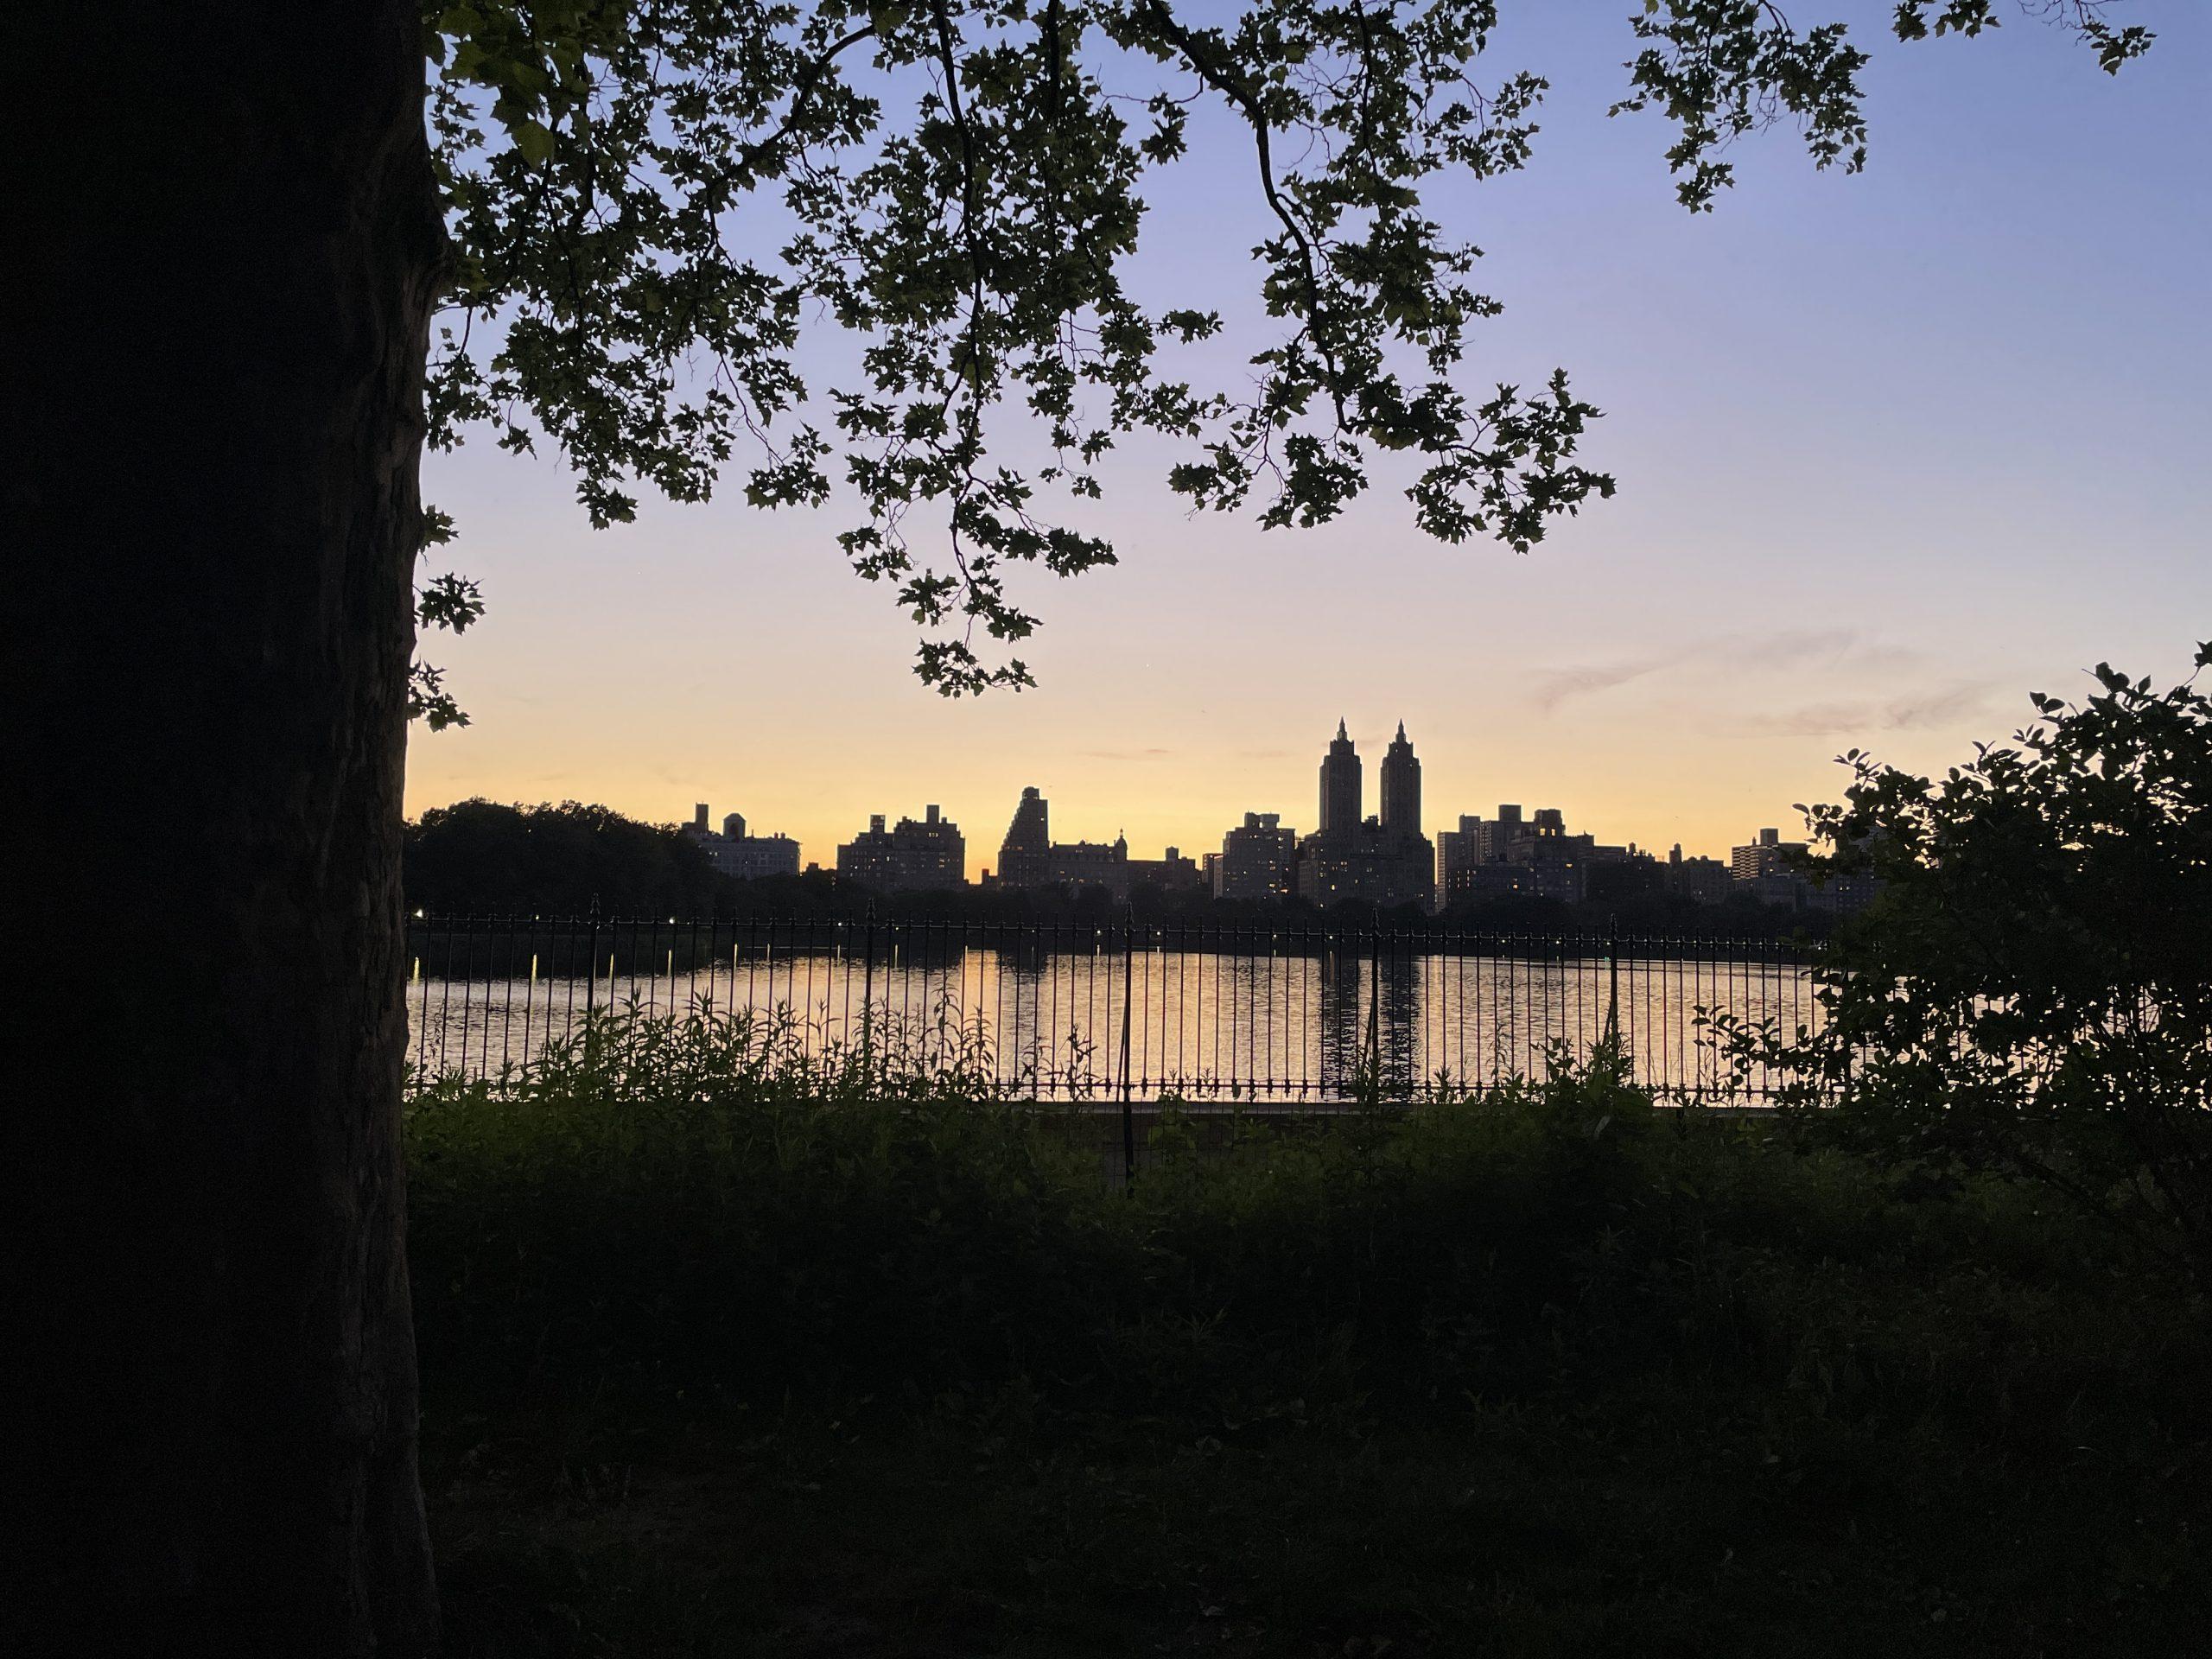 sunsets, twinkies and speakeasies